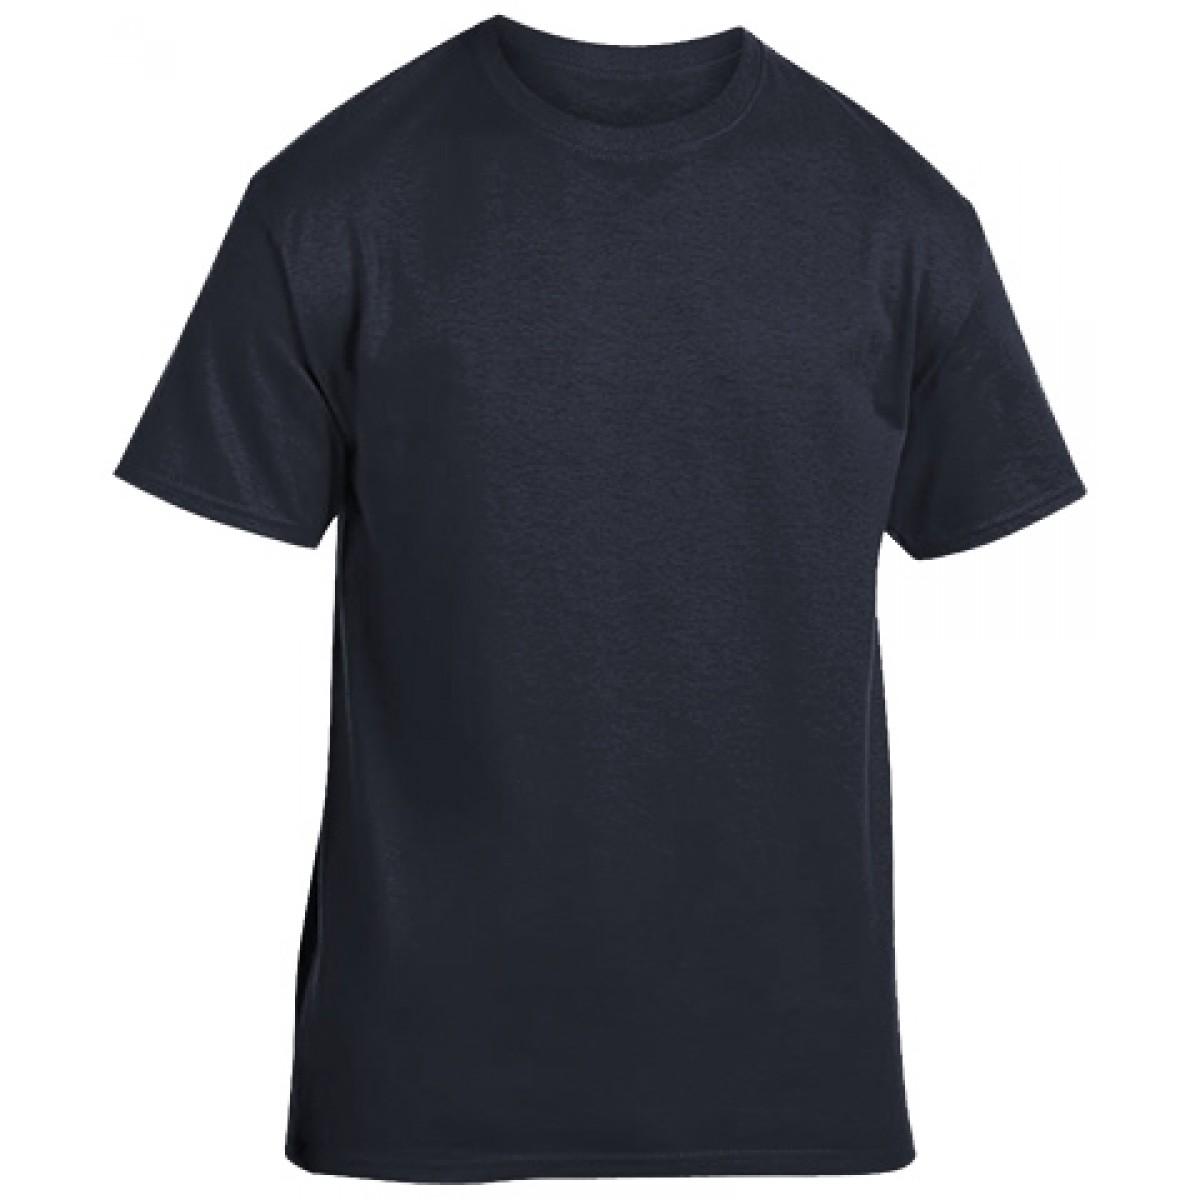 Soft 100% Cotton T-Shirt-Heather Navy-2XL